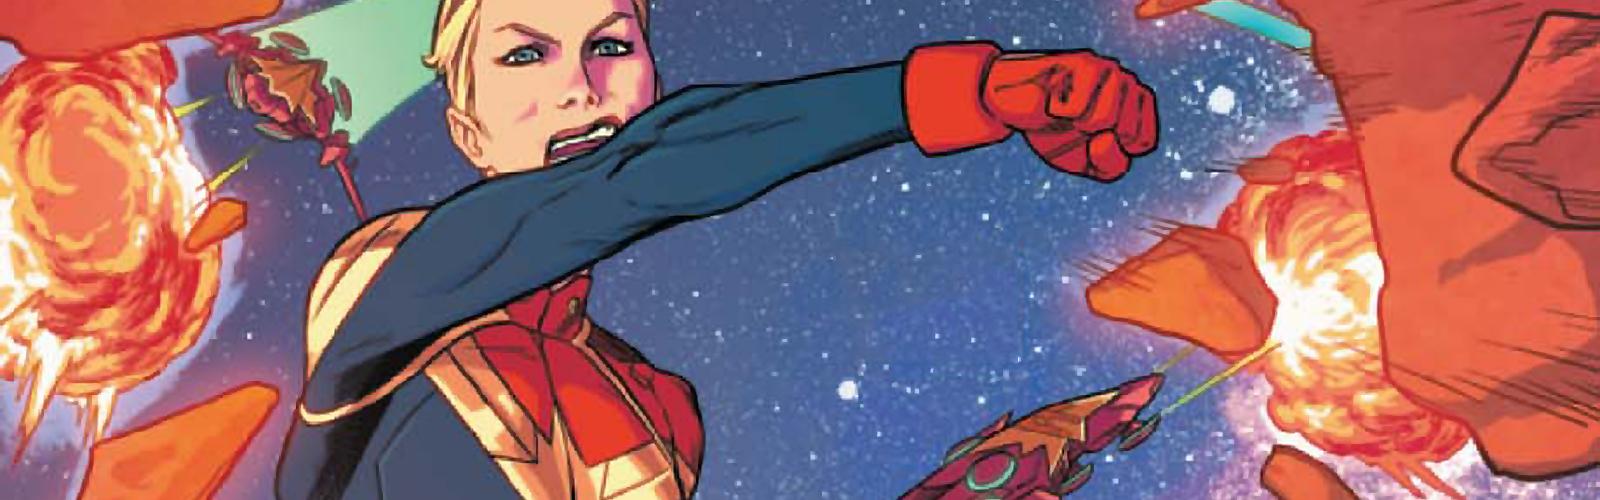 New Releases - 20-01-16: Captain Marvel